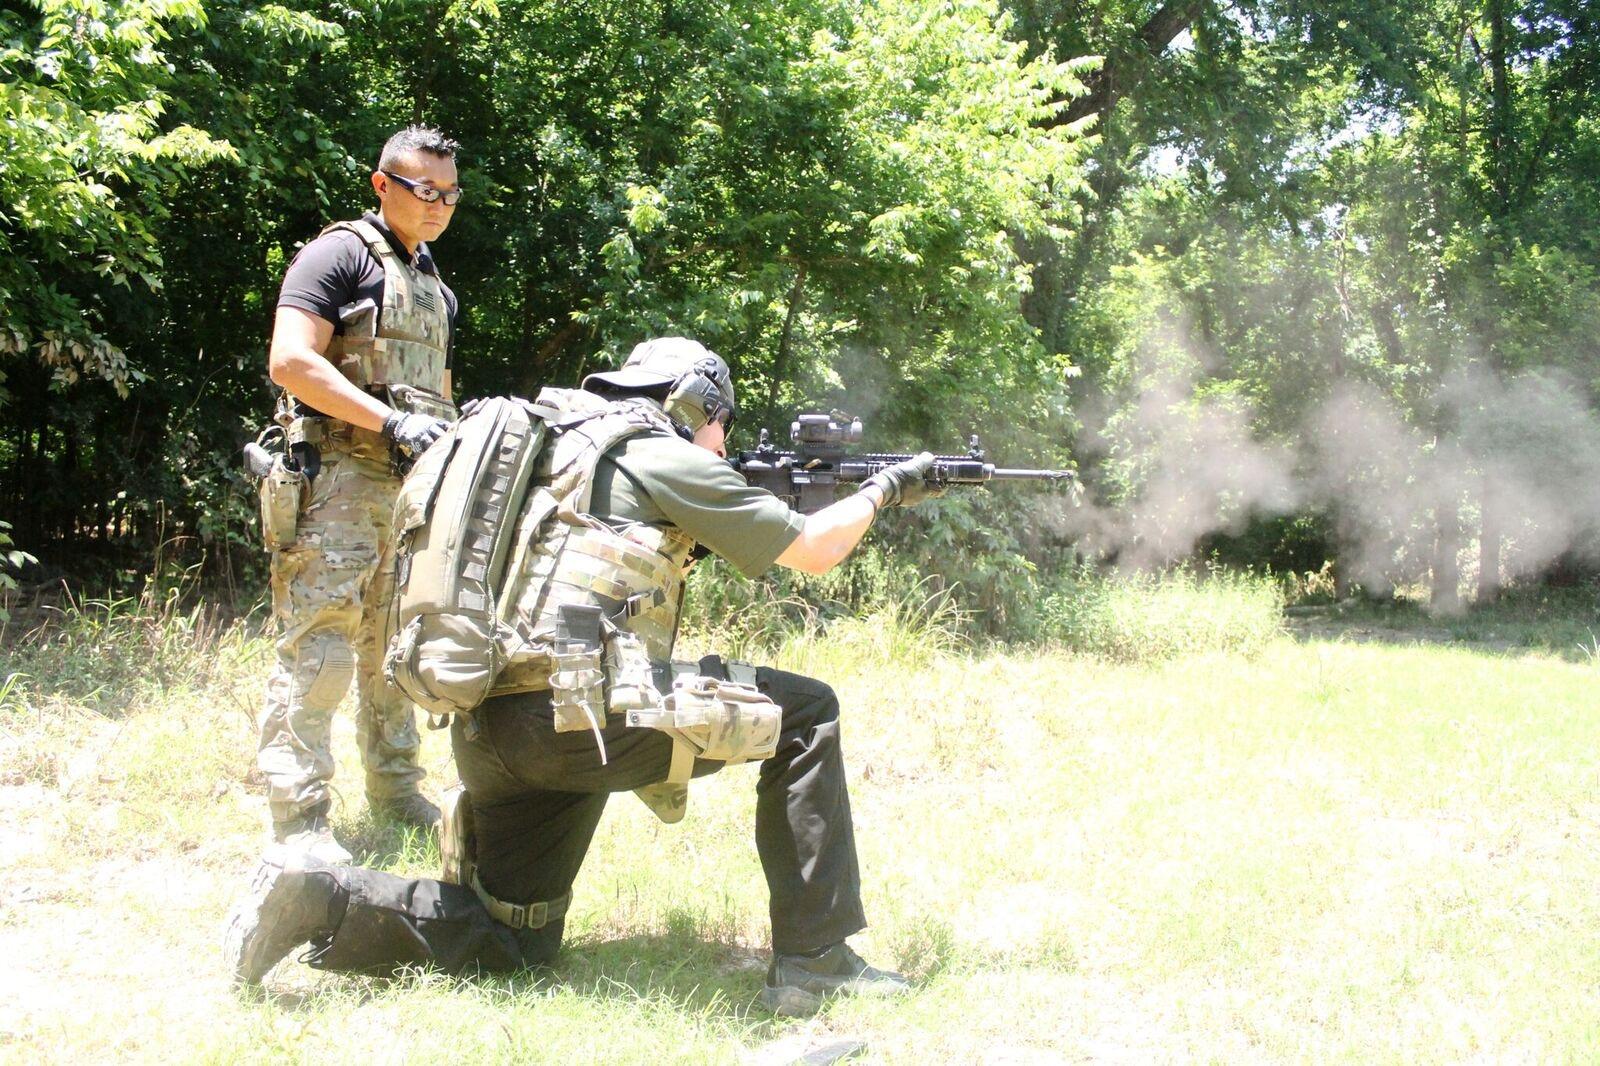 Carbine / AK Operator